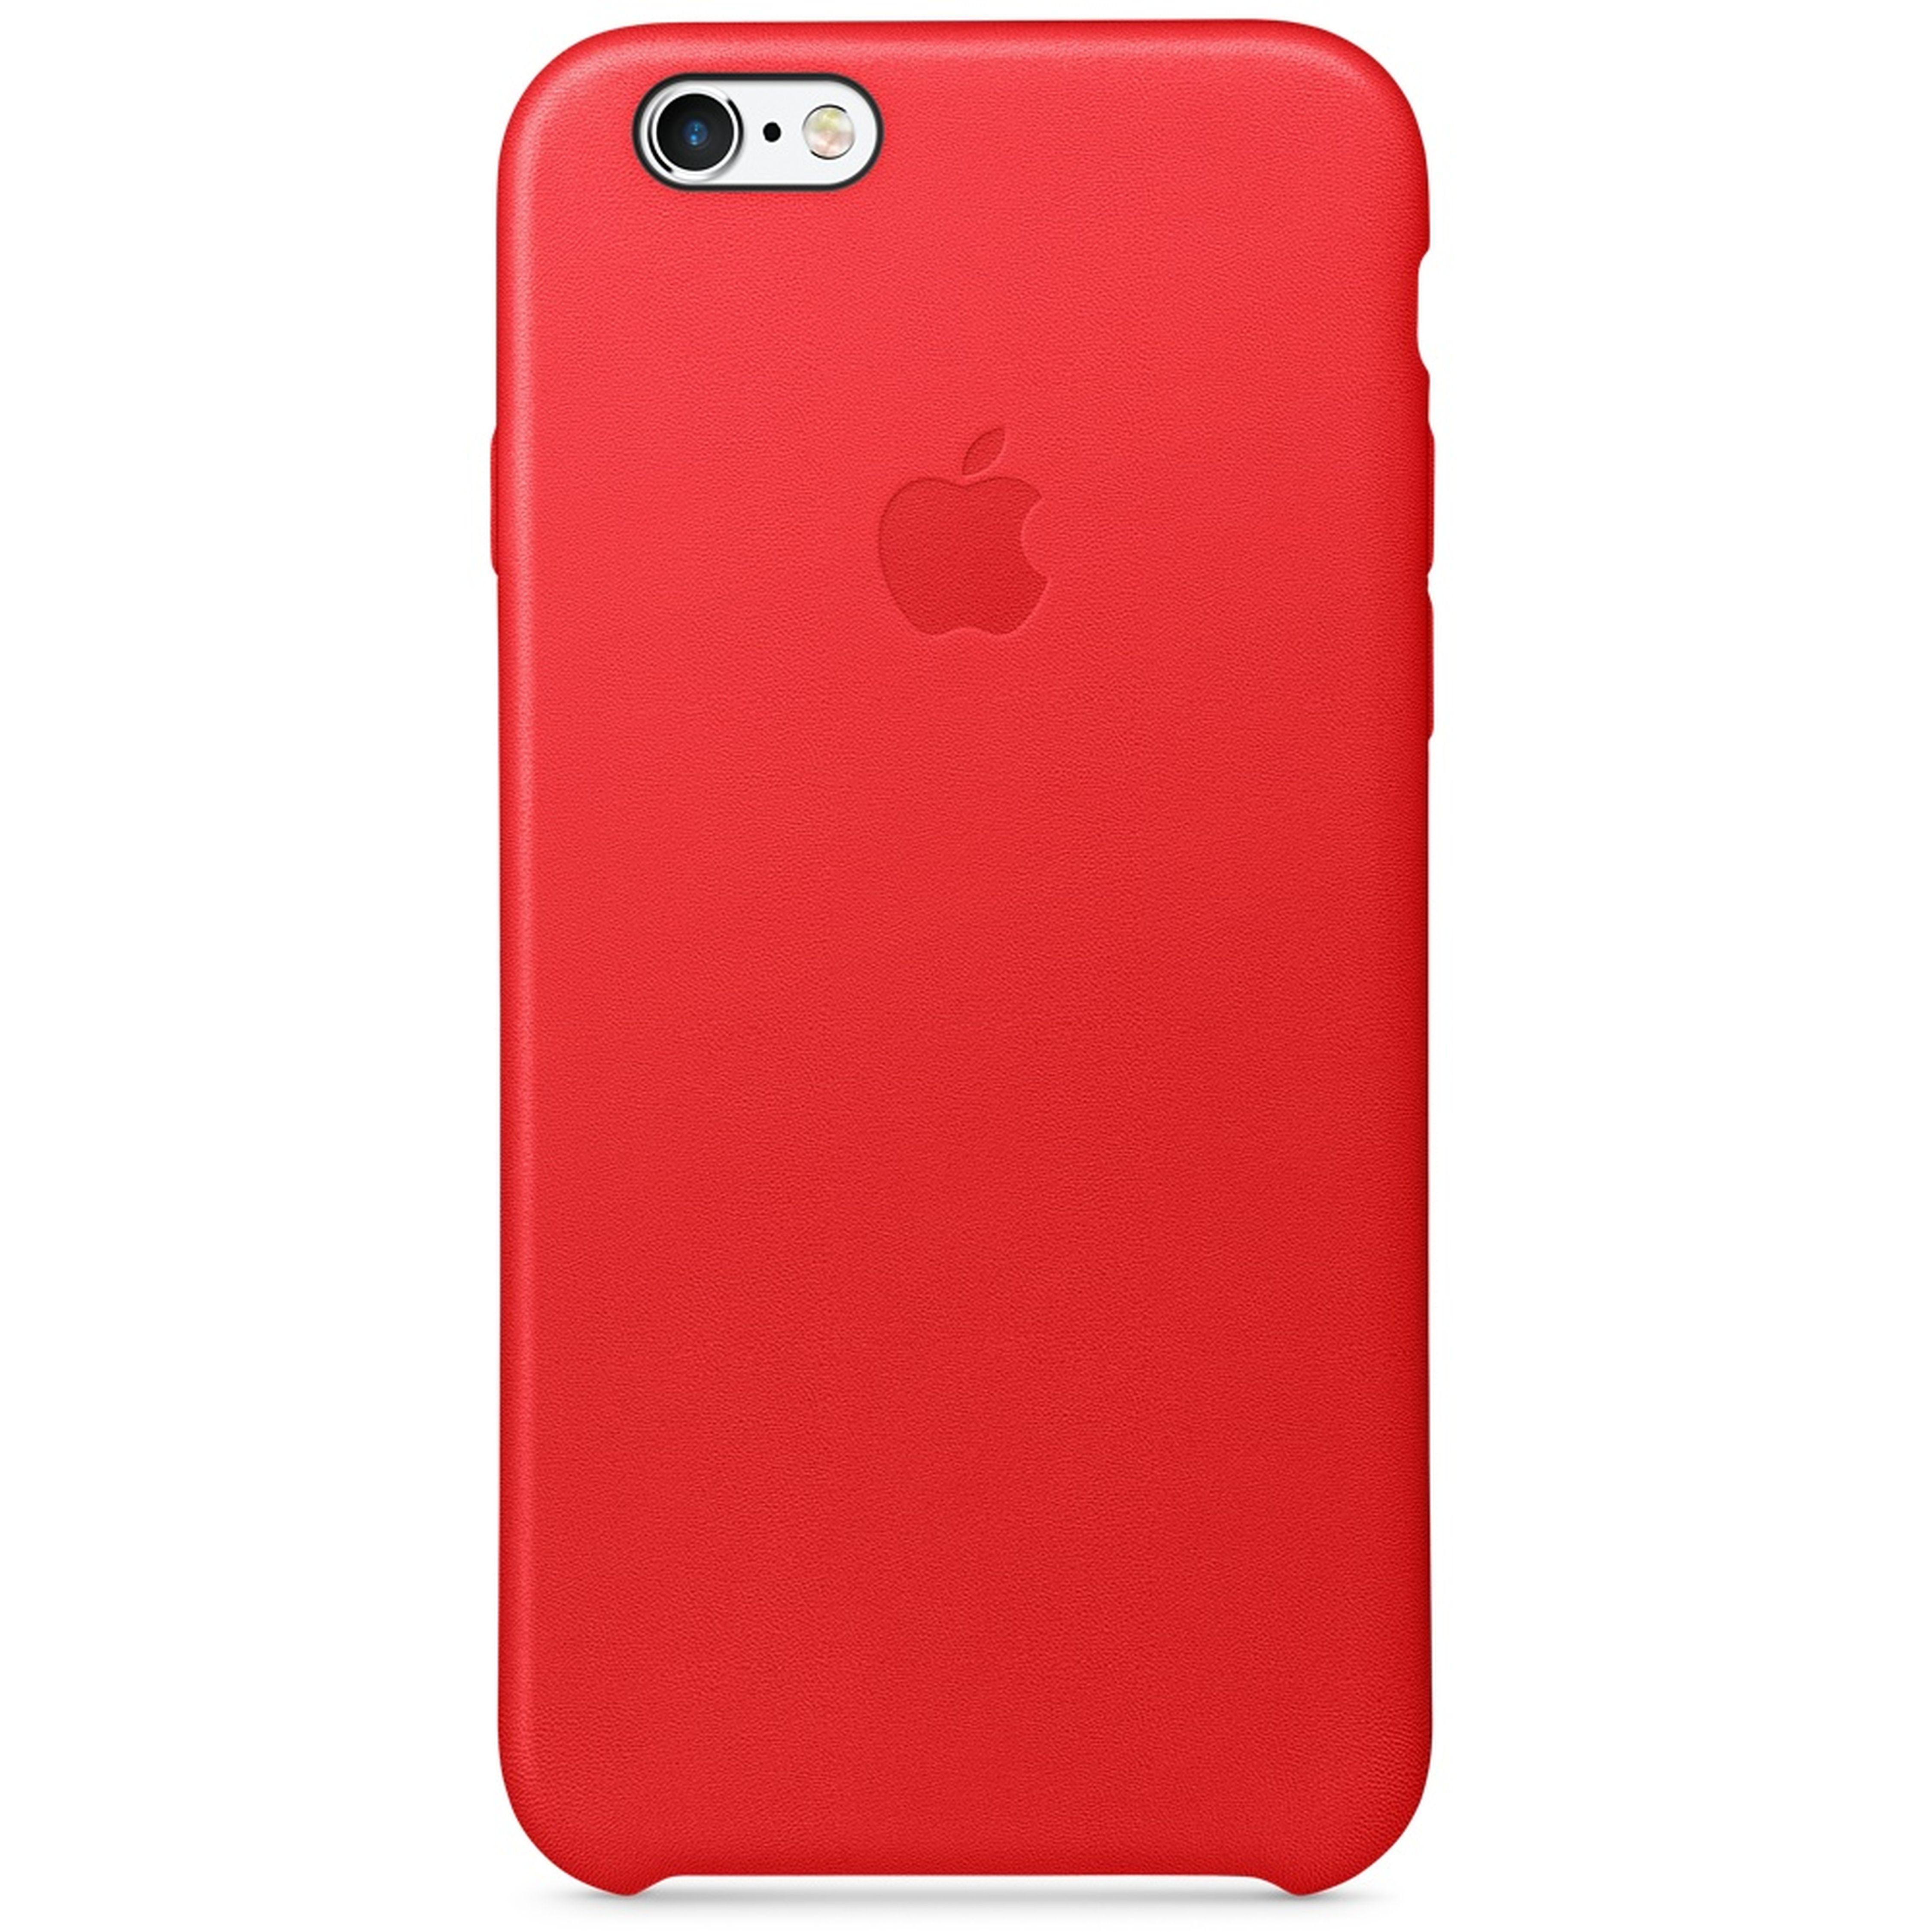 APPLE iPhone 6s Leder Case »Hintere Abdeckung für Mobiltelefon«